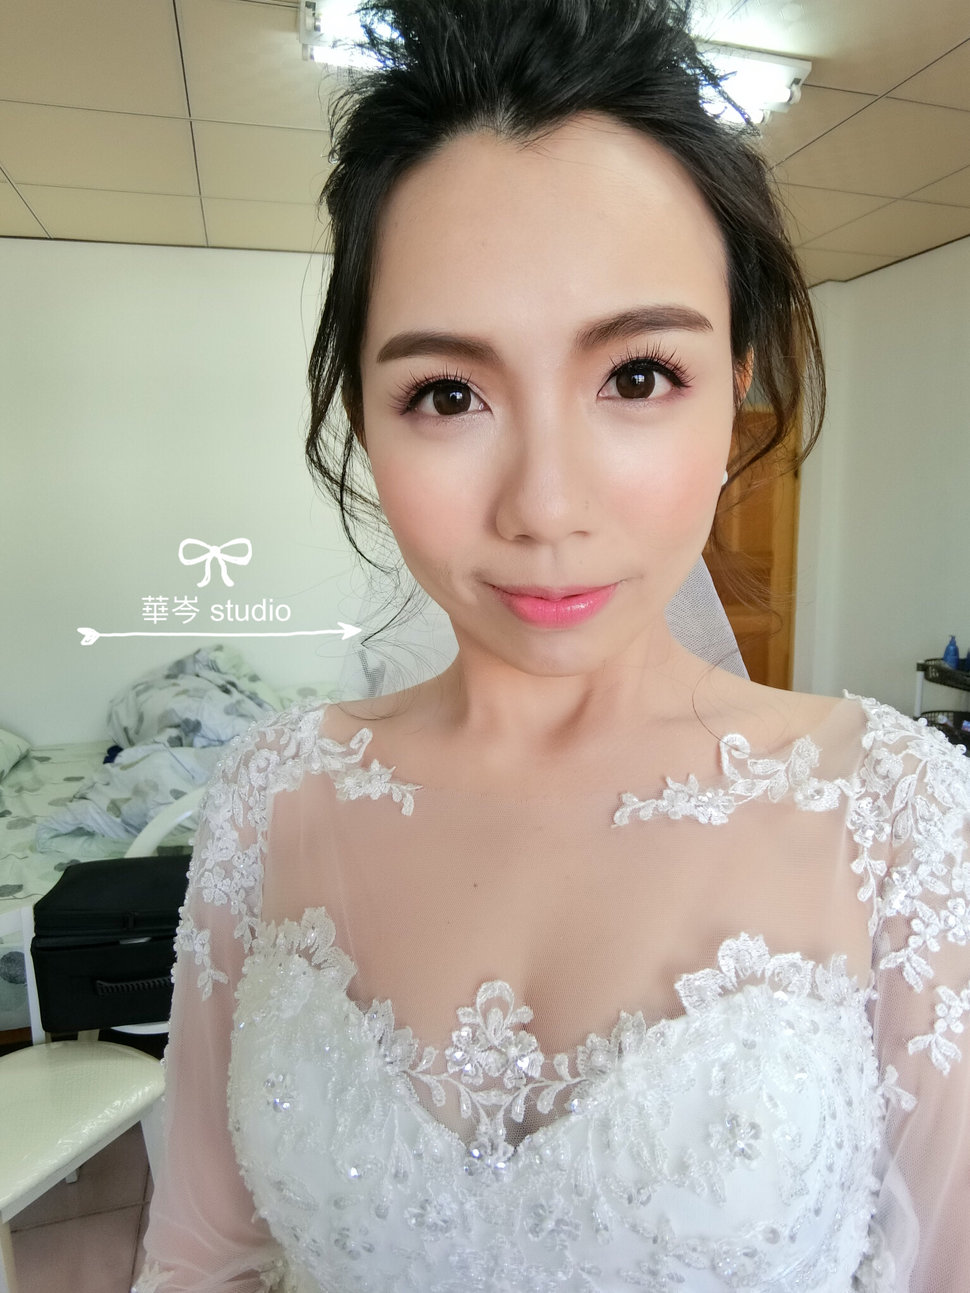 IMG_0685 - 華岑Zoey MakeUp Stylis - 結婚吧